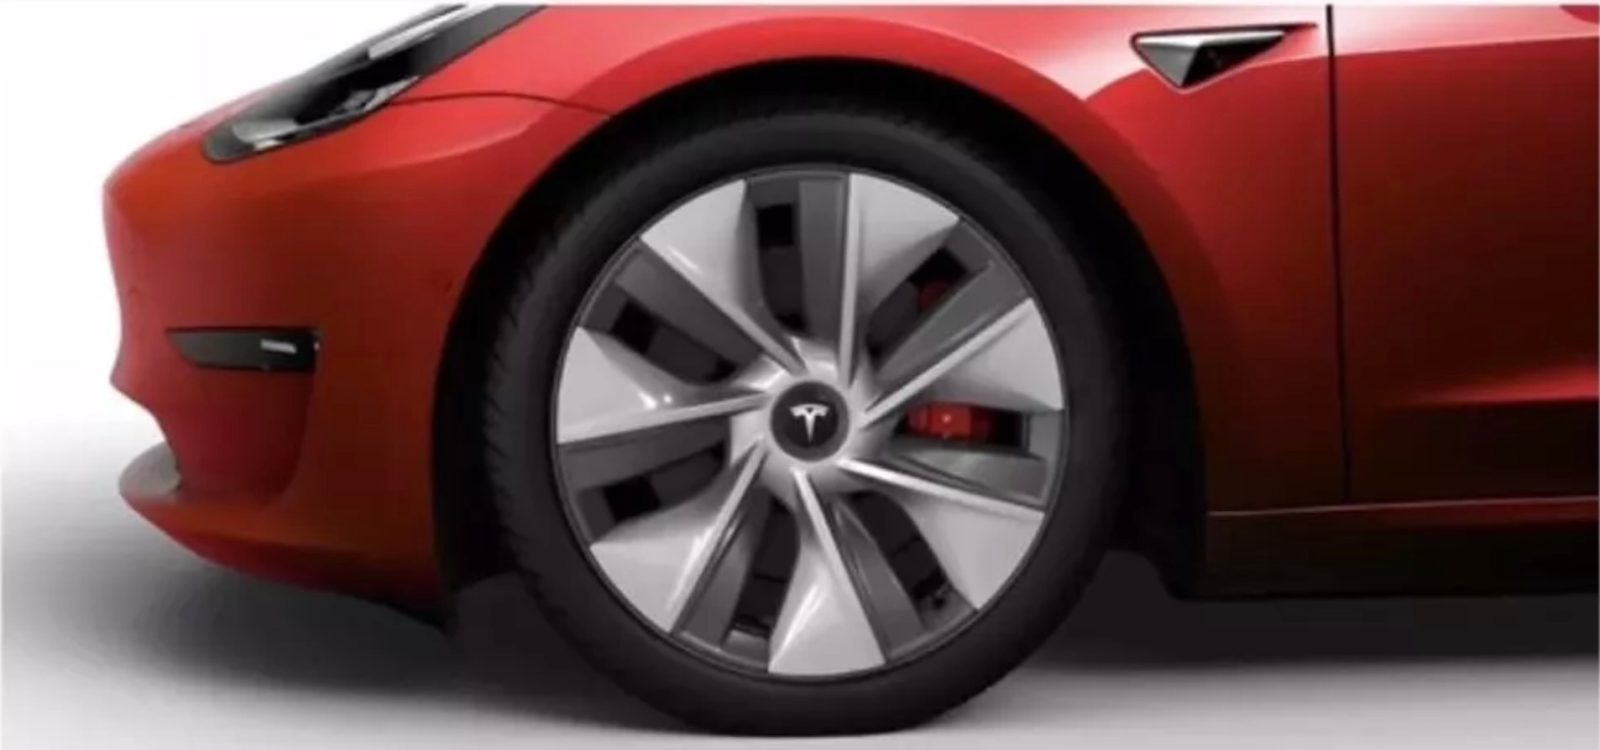 Tesla Starts Model 3 Orders In China Unveils New Wheel Design